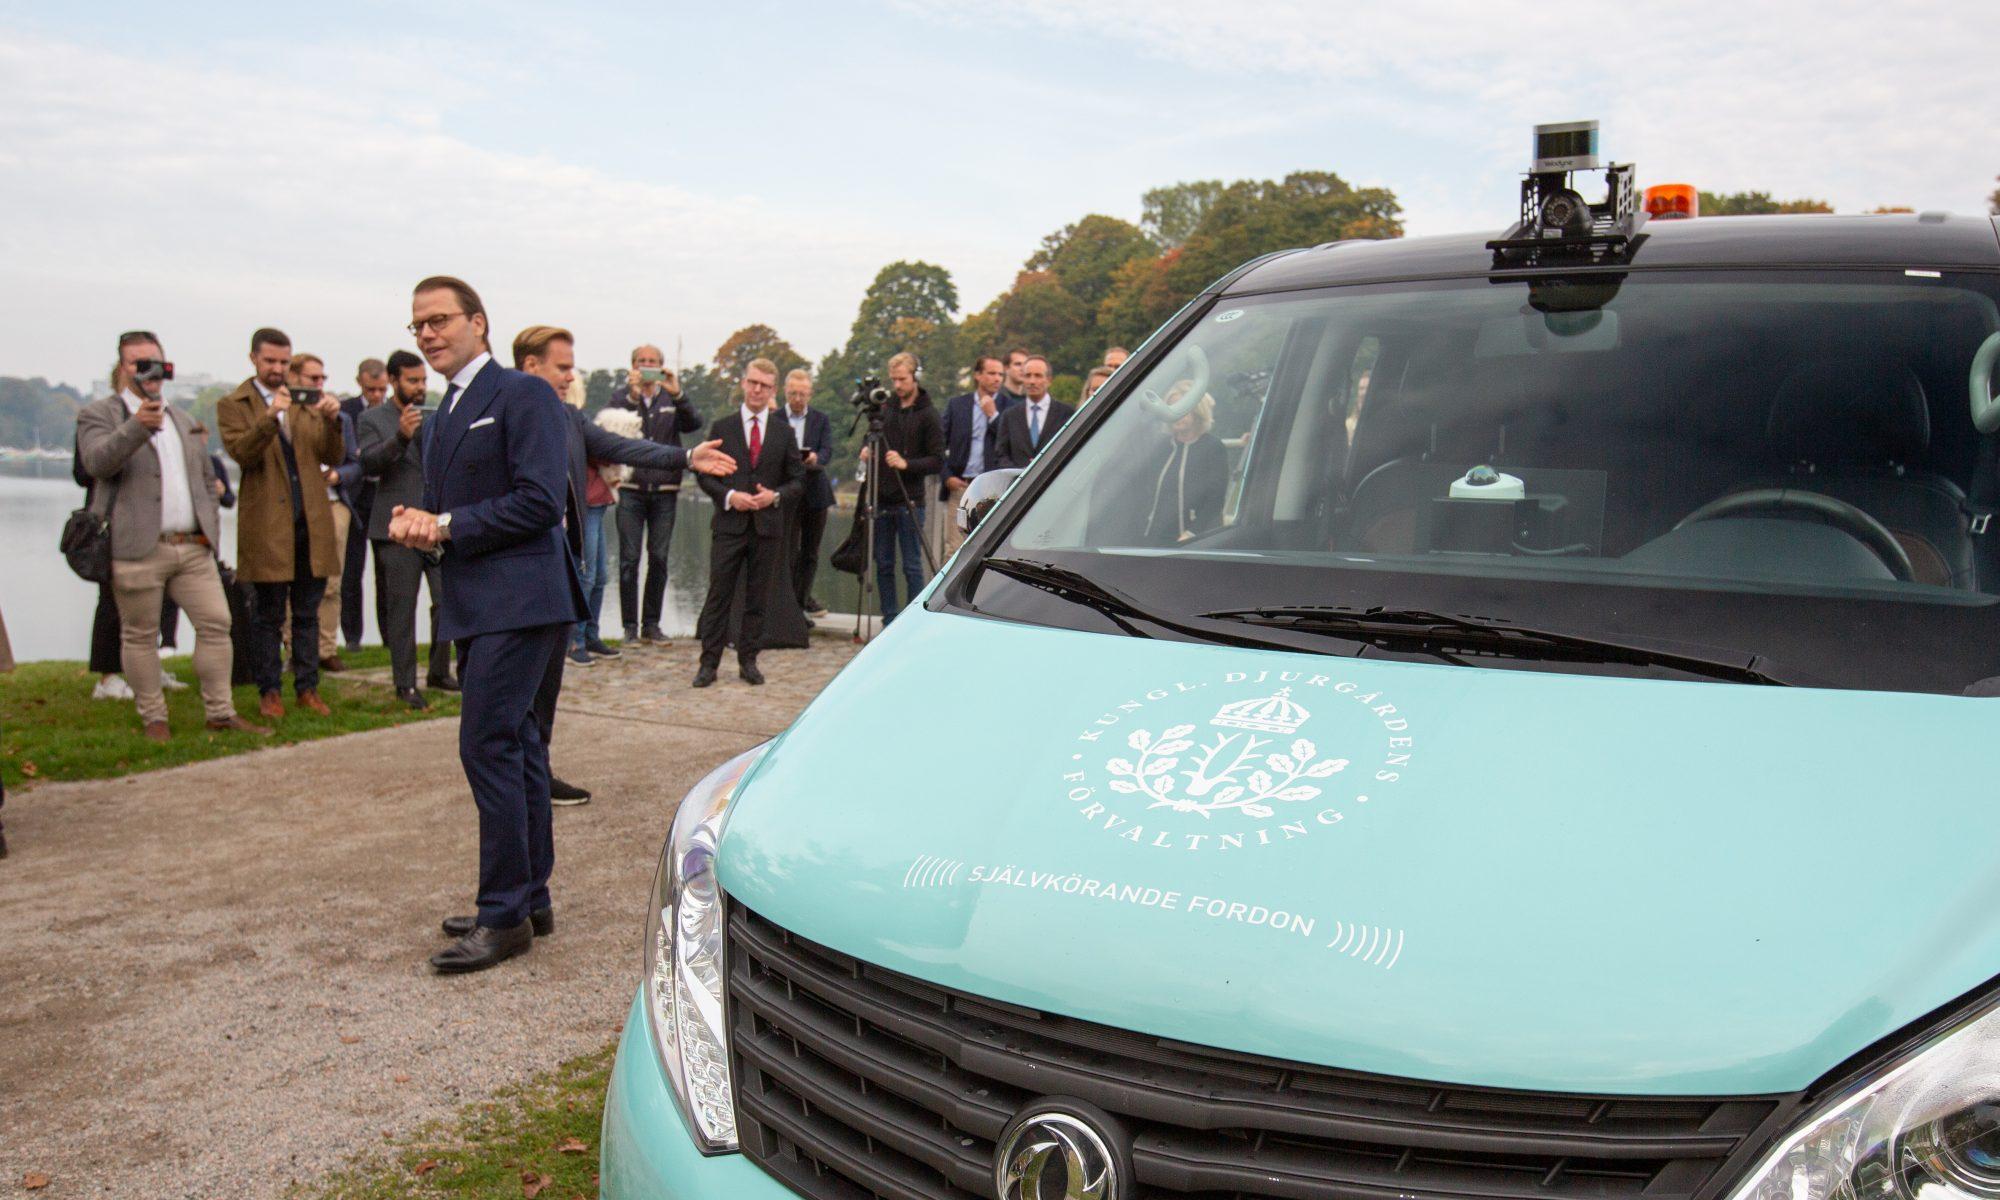 5G-powered self-driving, electric minibus premiere at Royal Djurgården